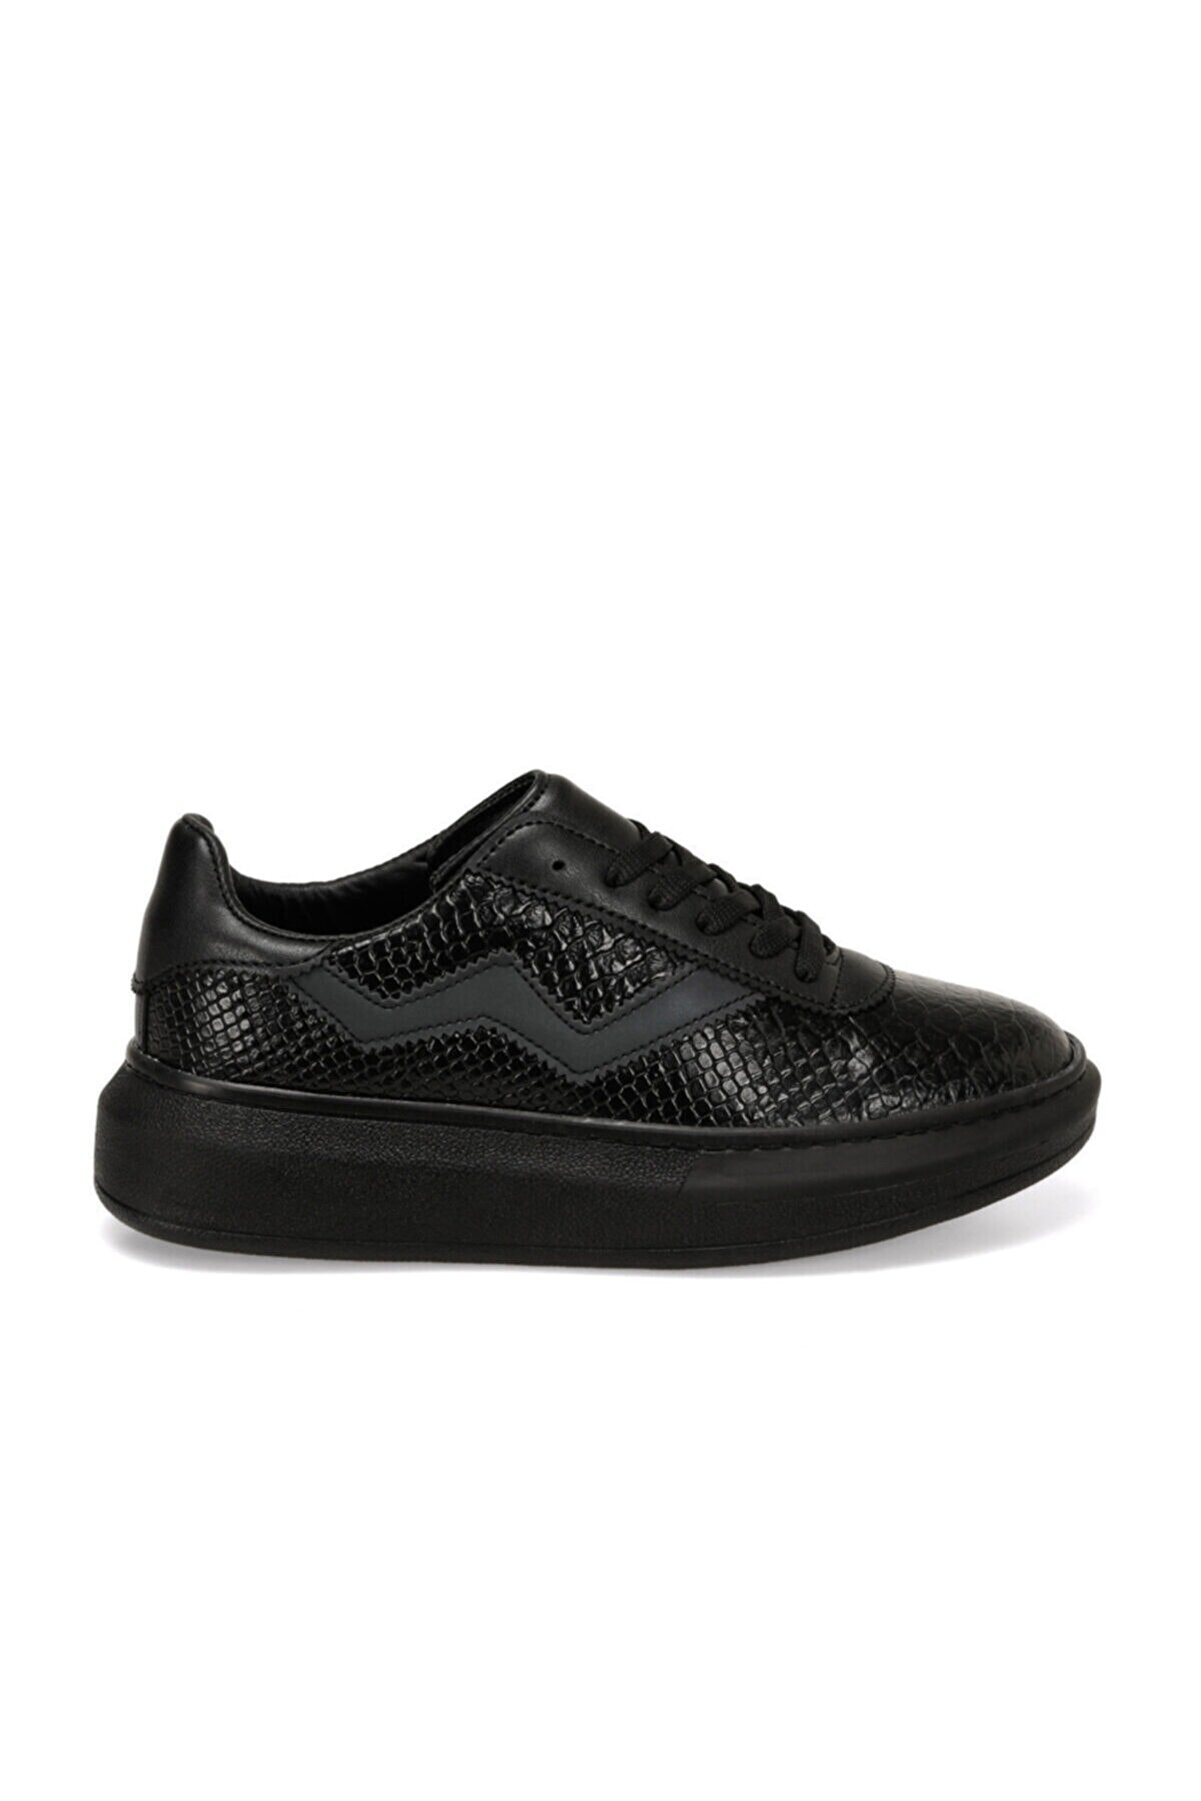 Butigo VİVİANA Siyah Kadın Havuz Taban Sneaker 100662989